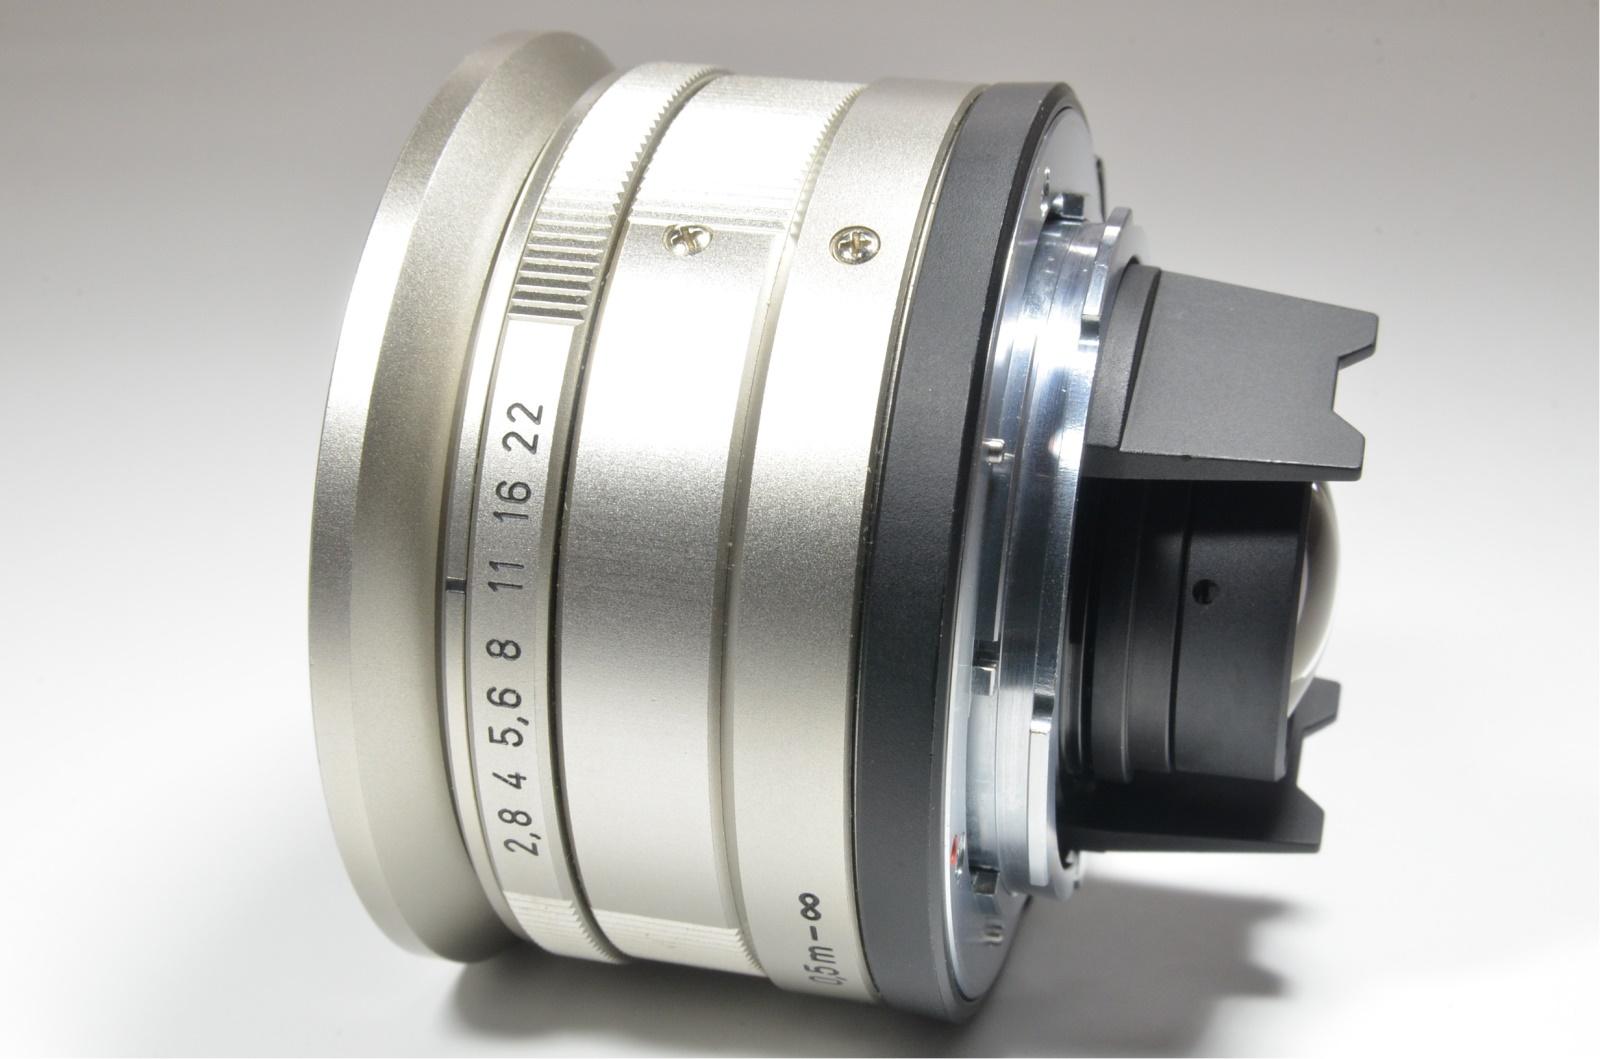 contax g2 with planar 45mm, biogon 21mm, viewfinder gf-21mm, sonnar 90mm, tla200